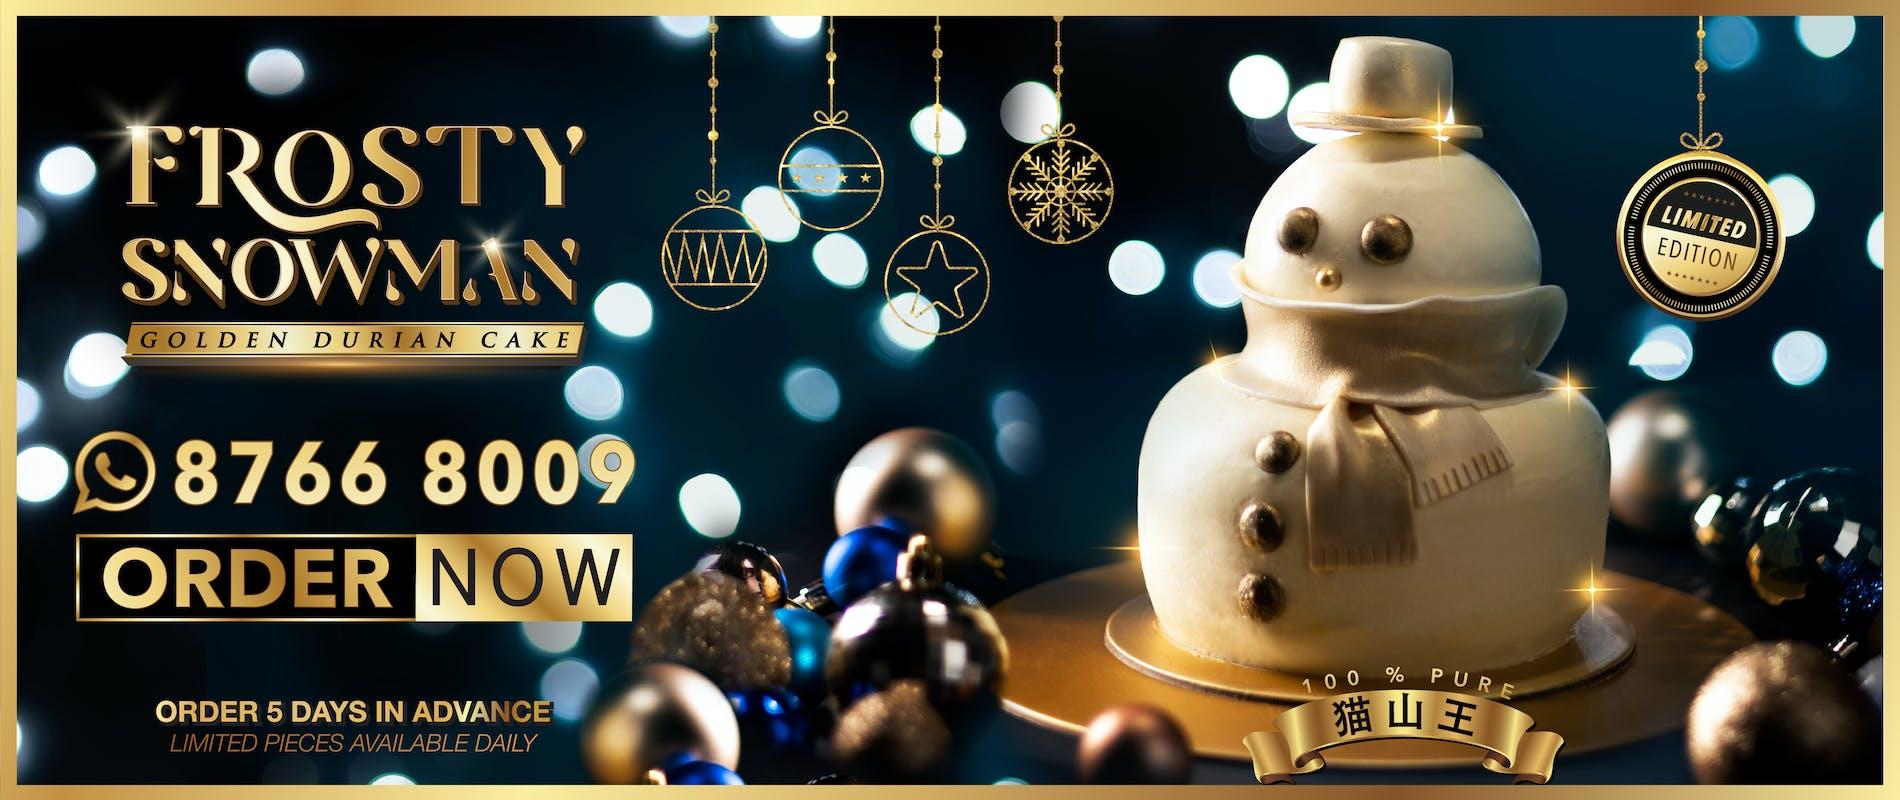 Christmas, Snow, Holiday, Cake, Durian, Freezing, Desserts, Sweet, Mao Shan Wang